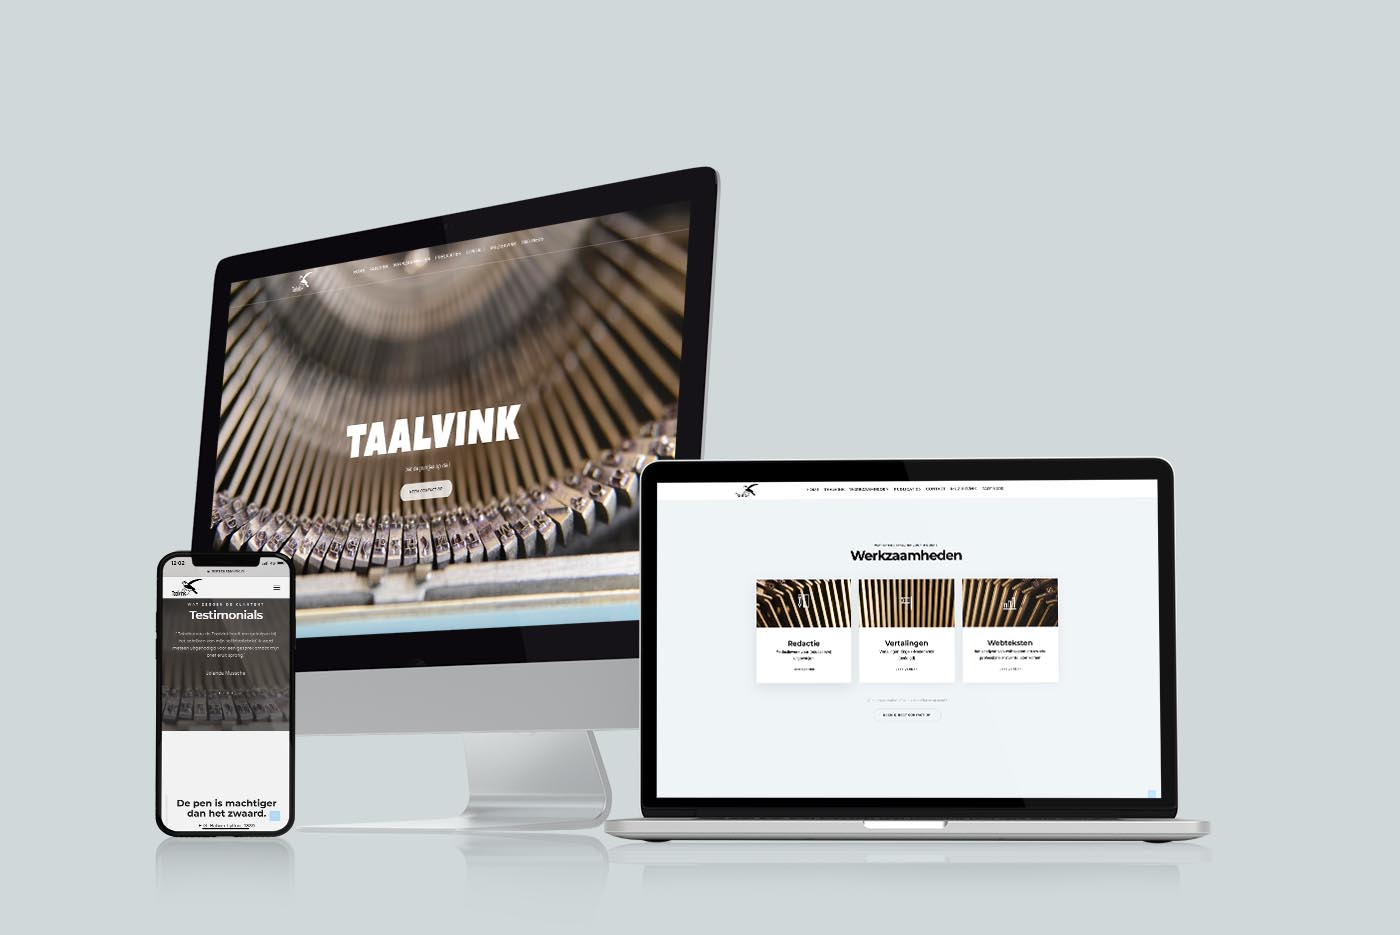 Webdesign Tekstbureau de Taalvink